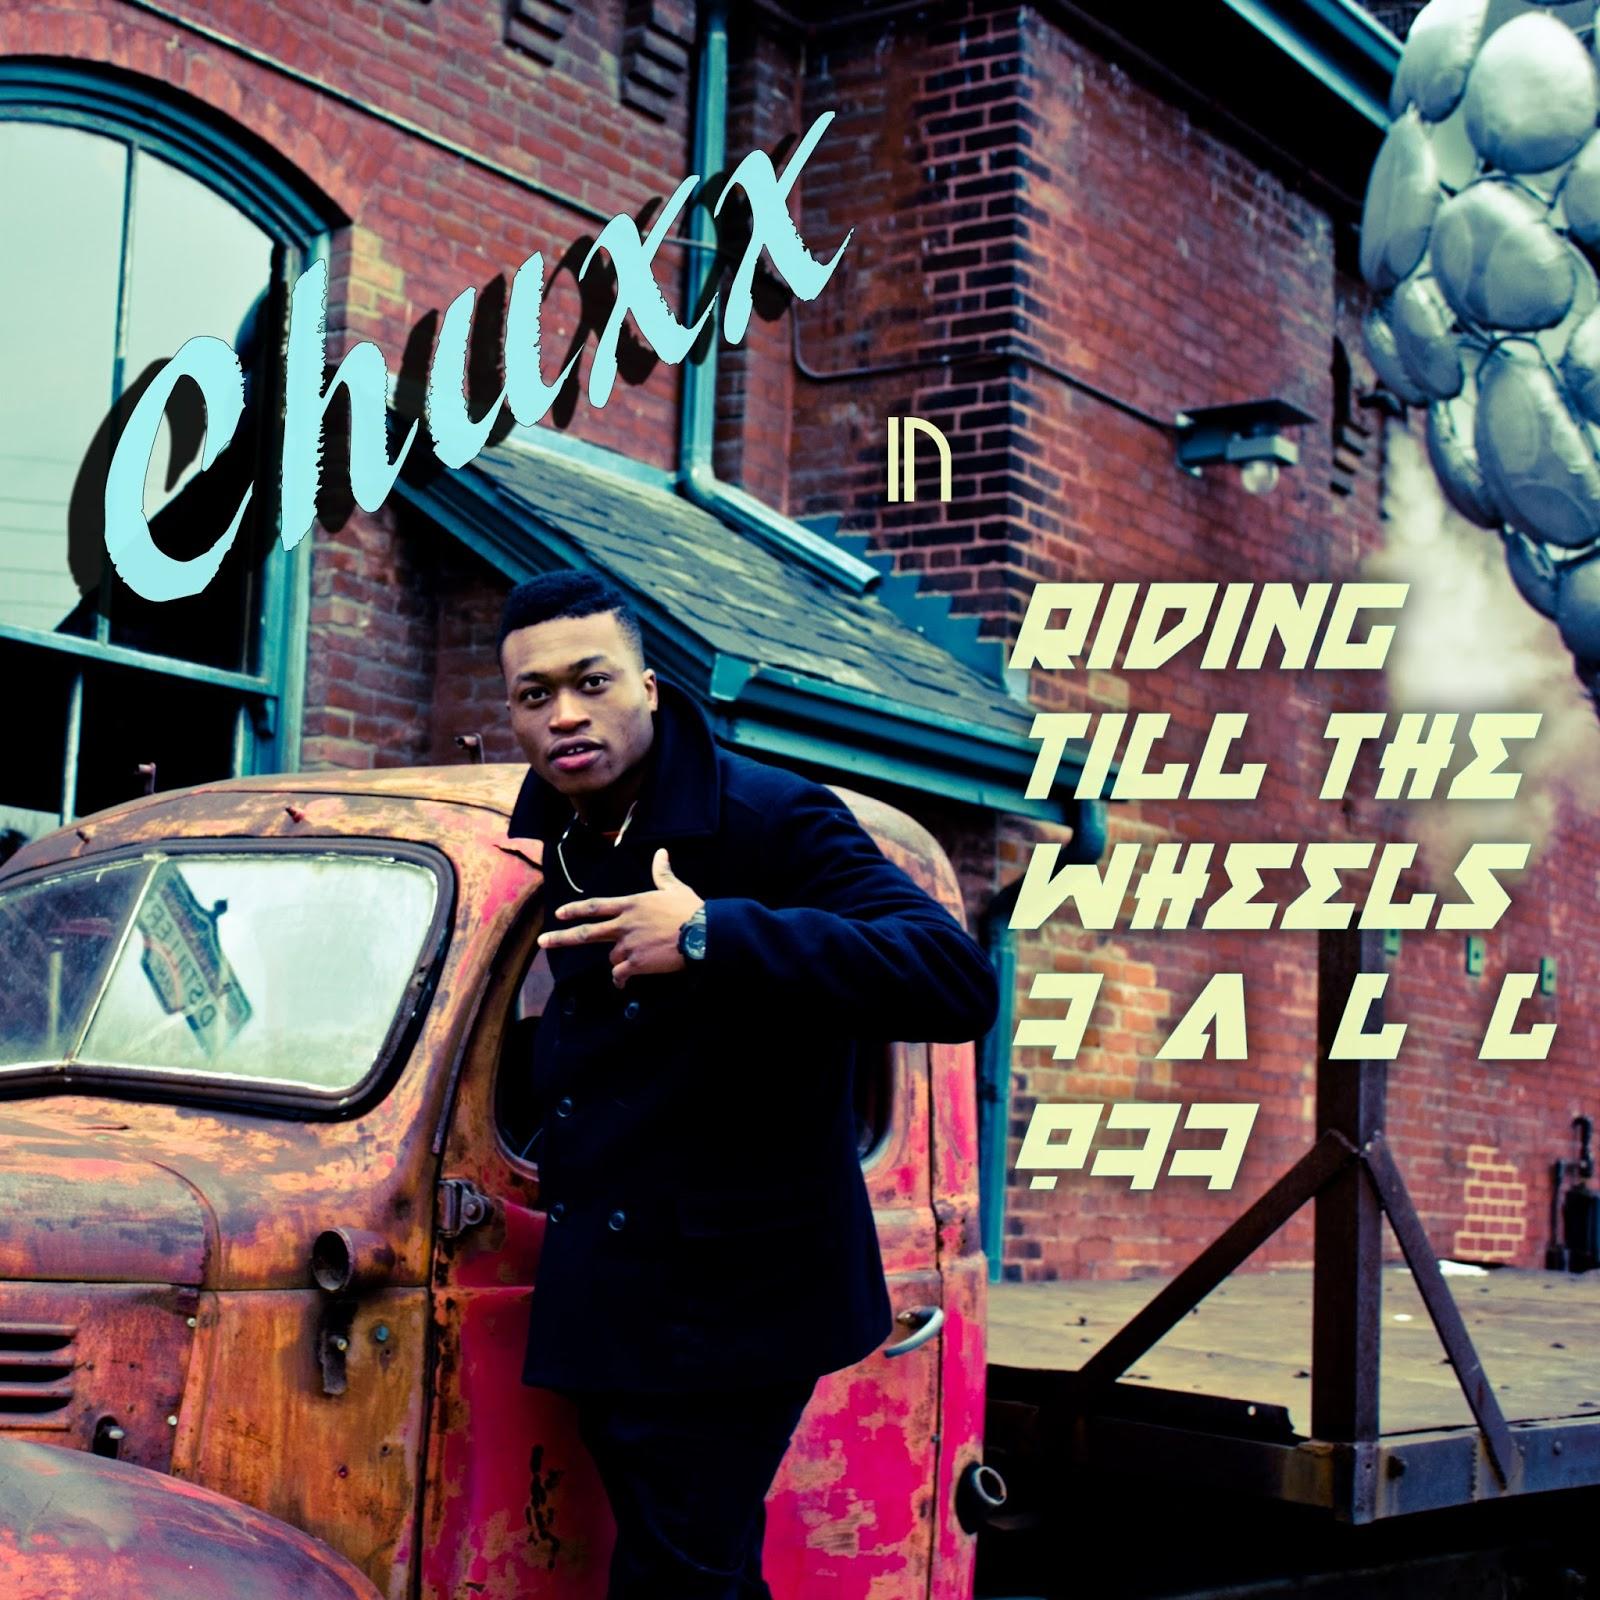 Chuxx Riding Till The Wheels Fall Off